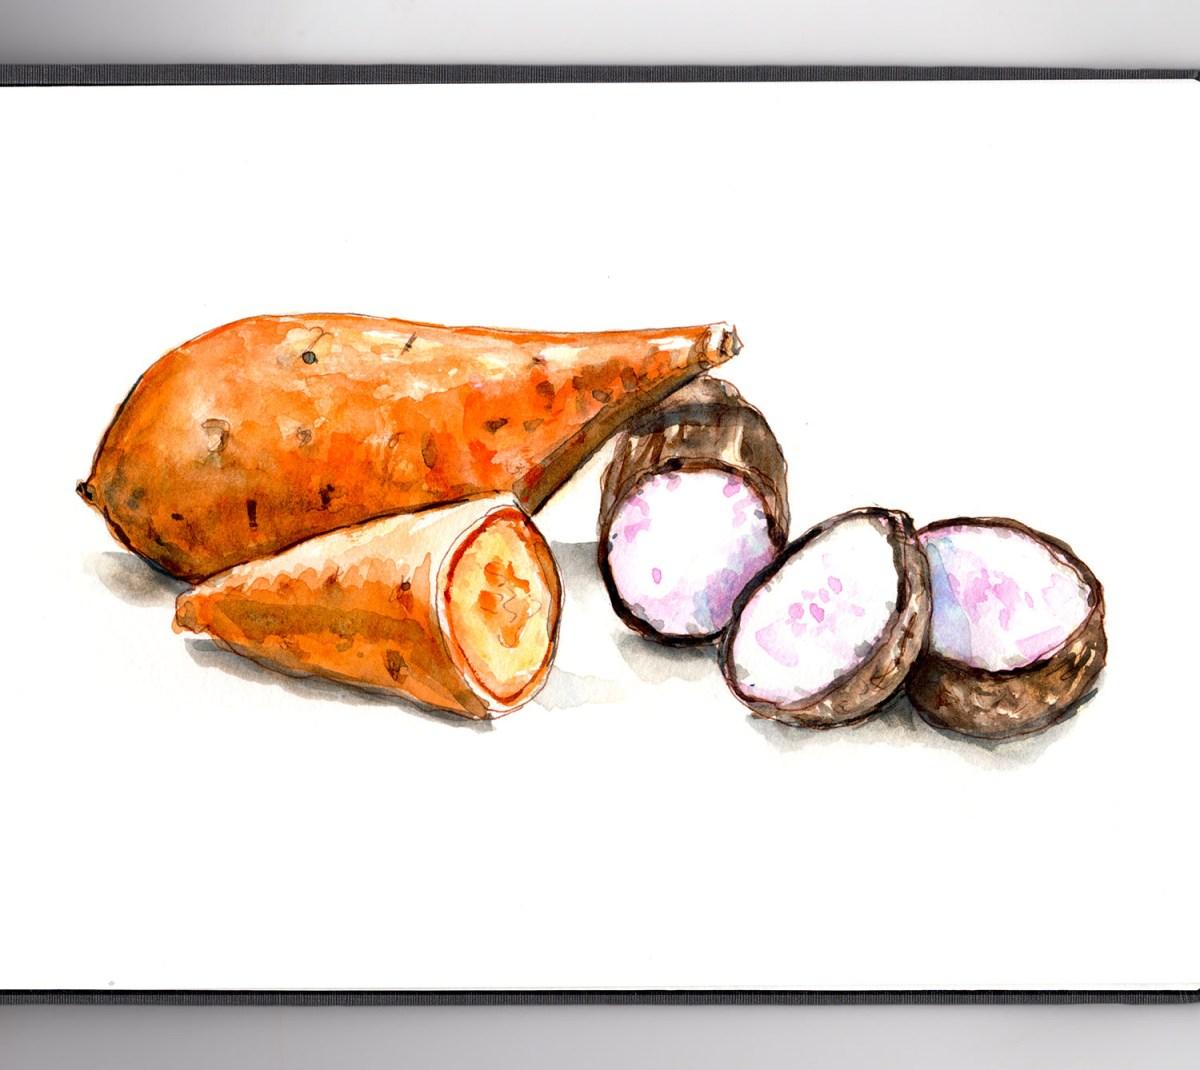 #WorldWatercolorGroup - Day 20 - Sweet Potatoes Vs Yams - Doodlewash